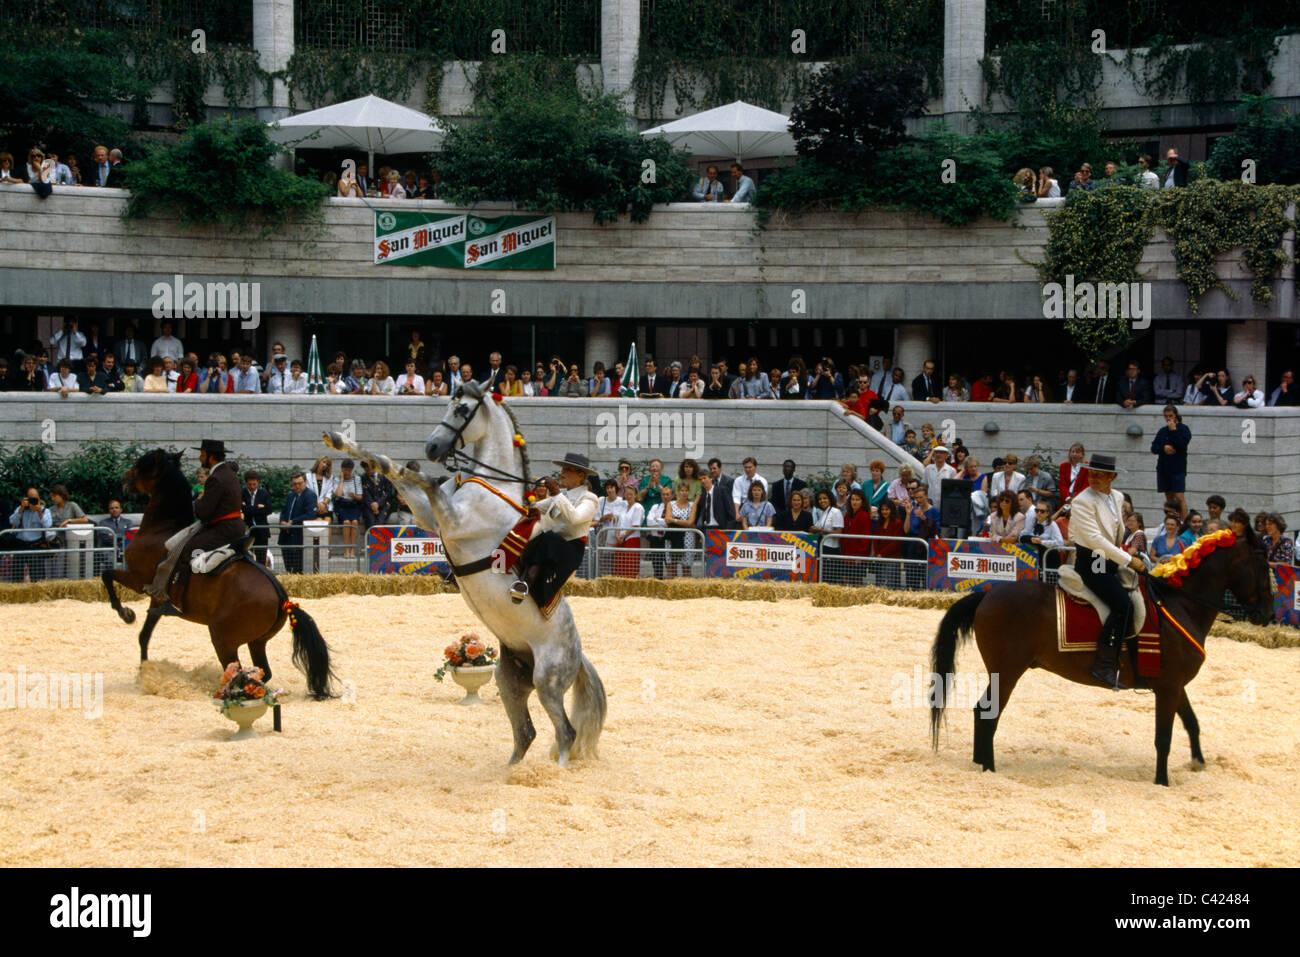 Spanish Riding School Performance In London Riders On Horseback - Stock Image